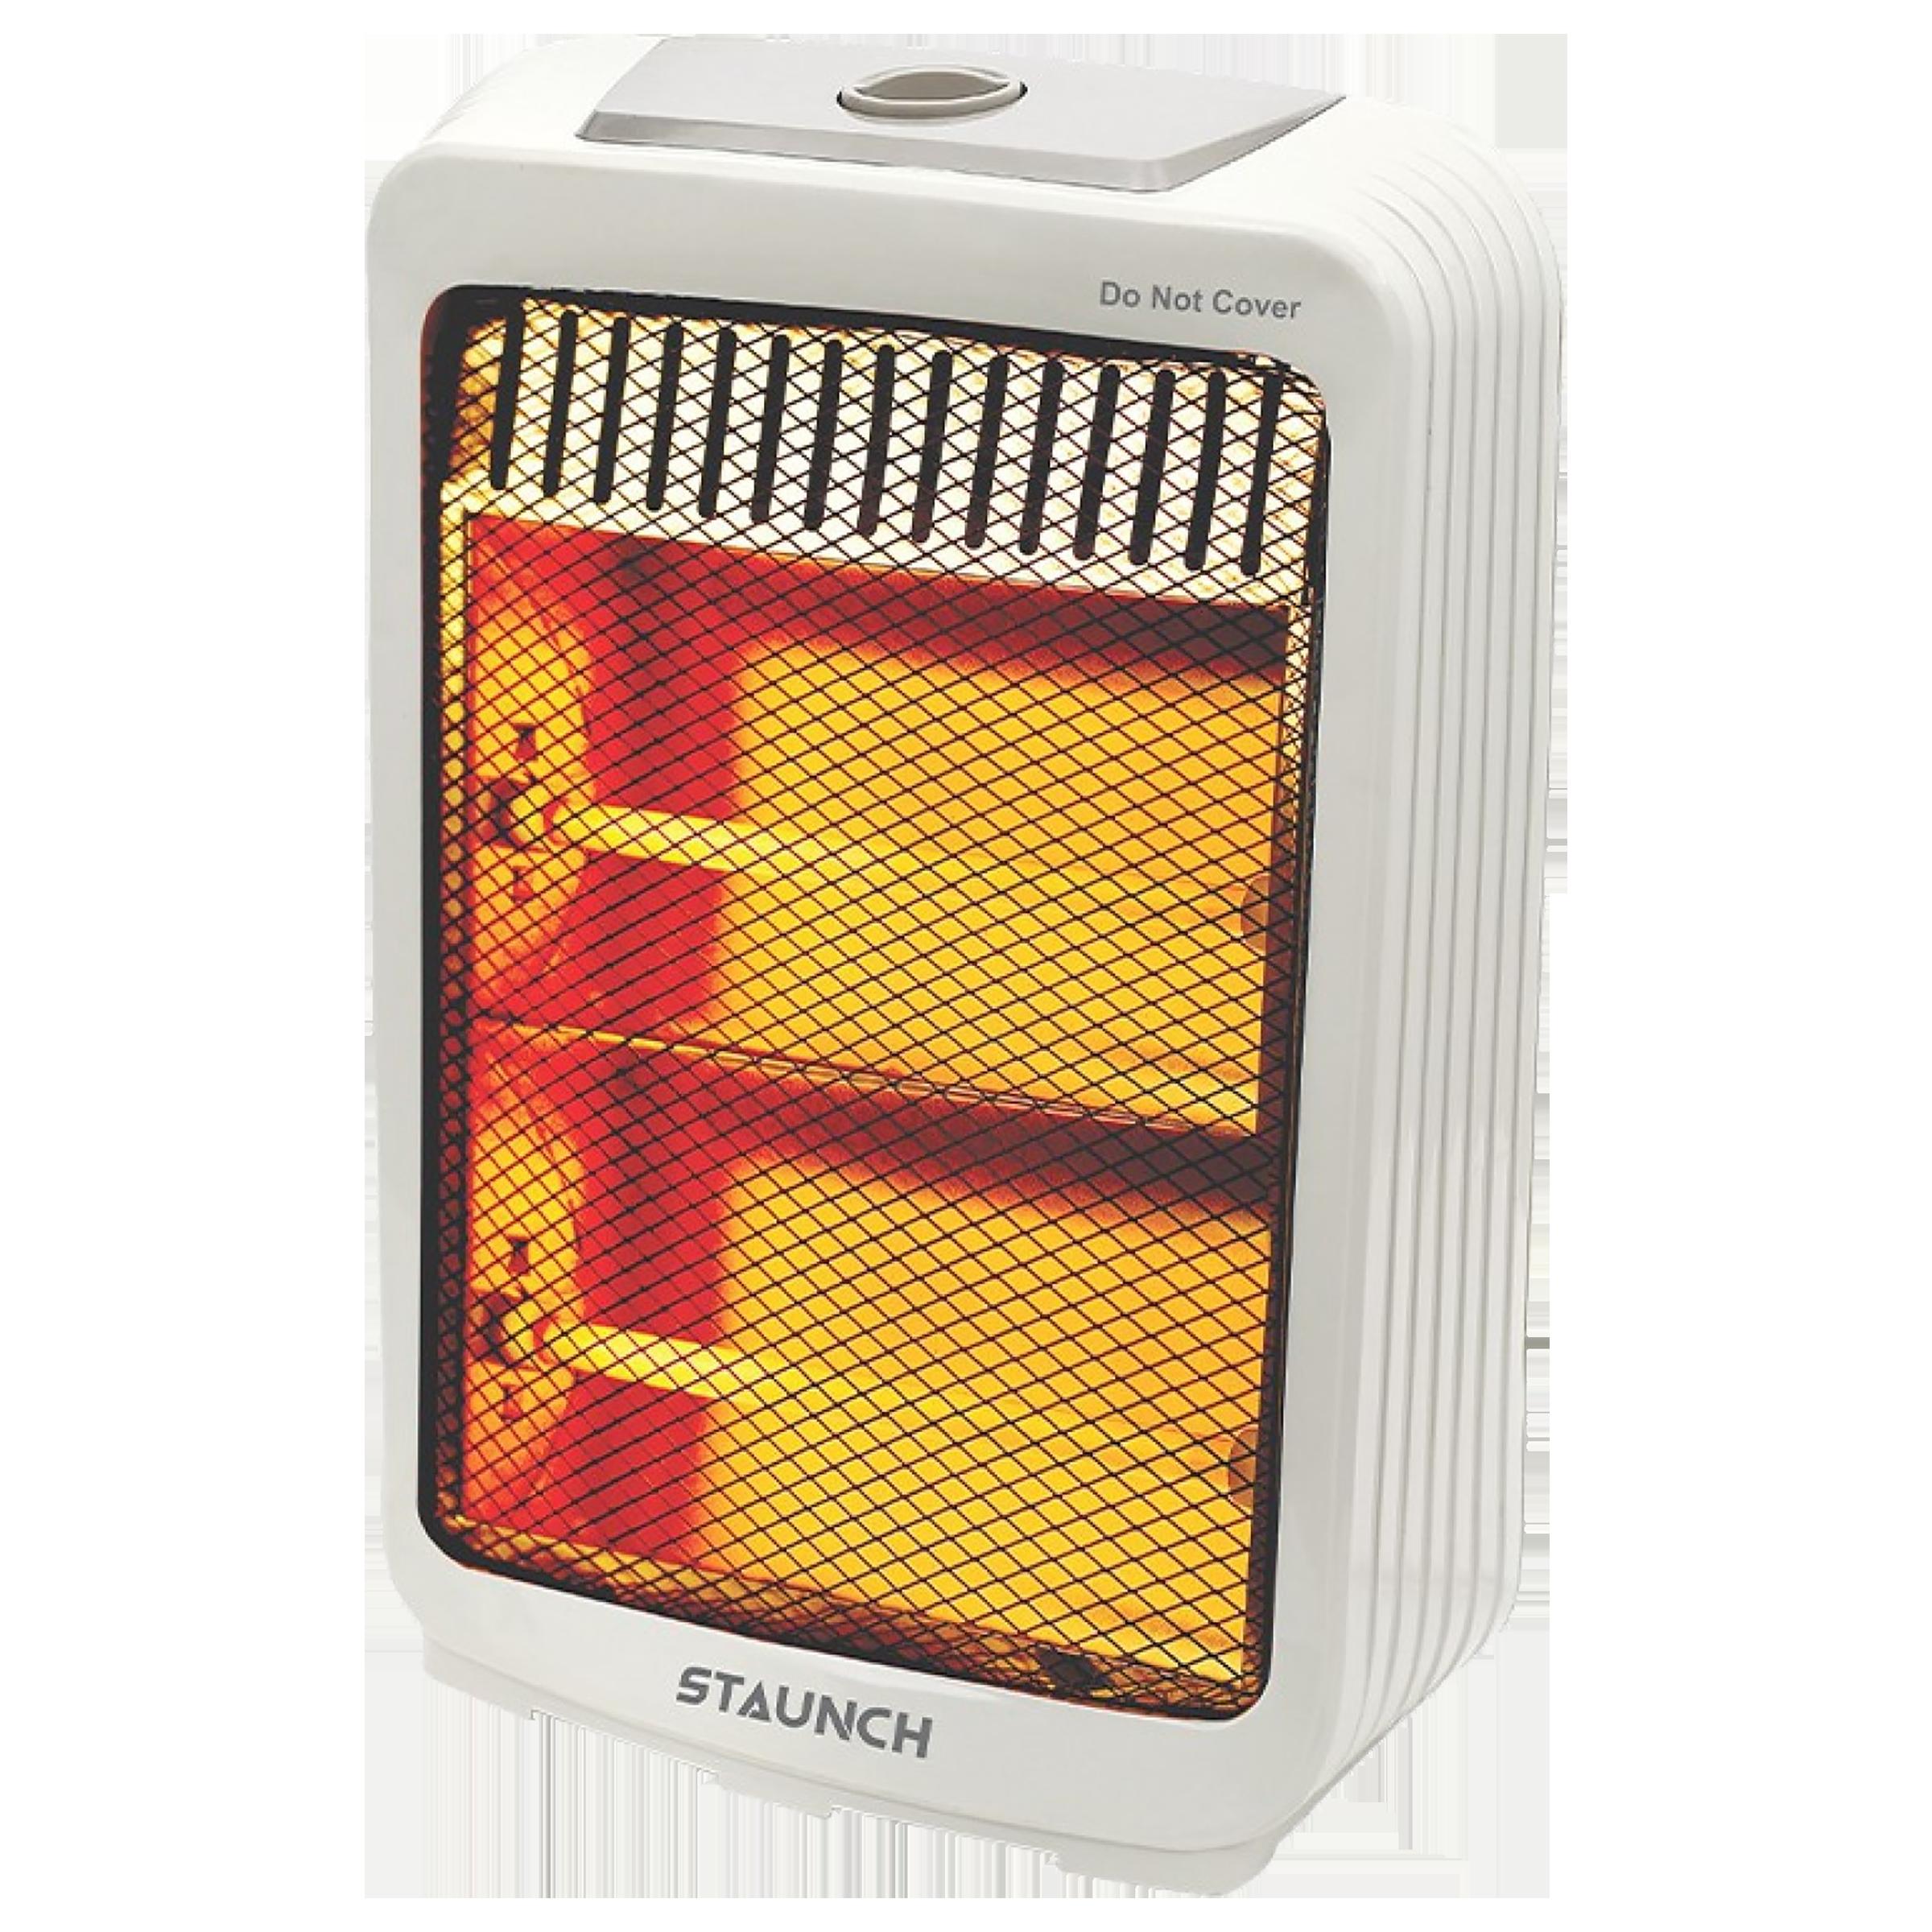 Staunch SH-103 800 Watts Halogen Heater (Overheating Protection, White)_1